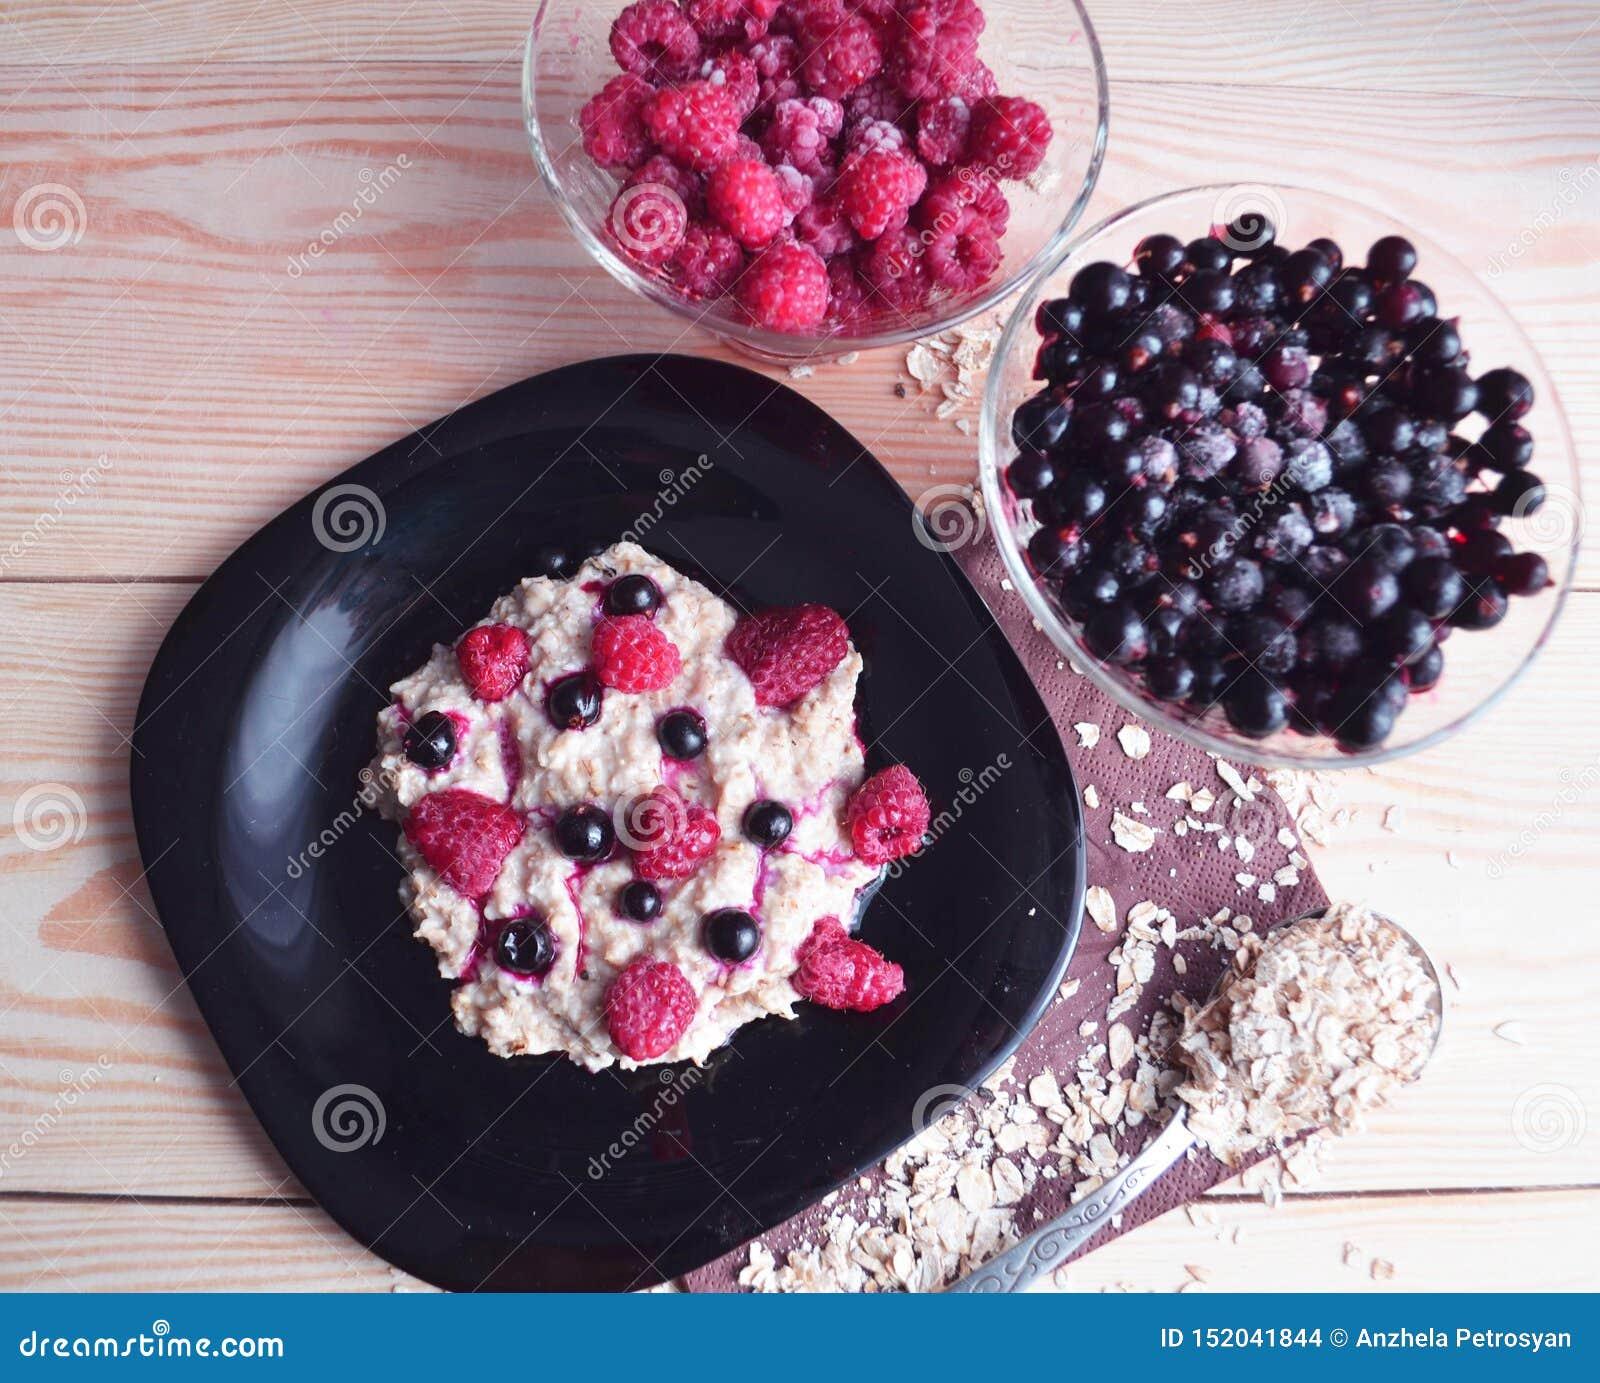 Oatmeal porridge with fresh raspberry and blueberry